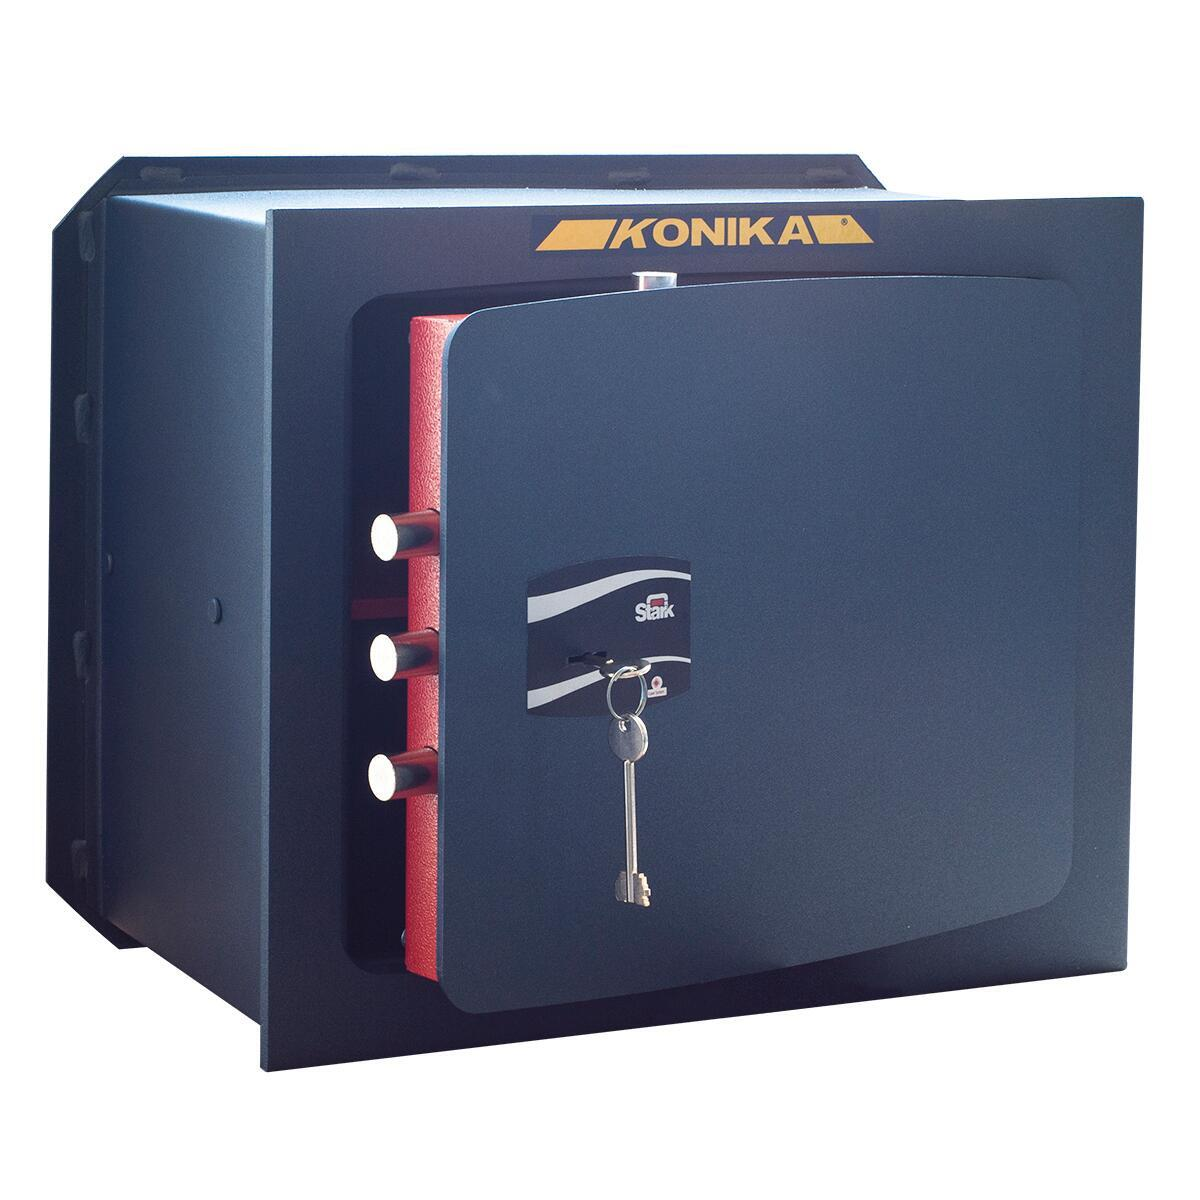 Cassaforte a chiave STARK 1205P da murare L32 x P24 x H49 cm - 1